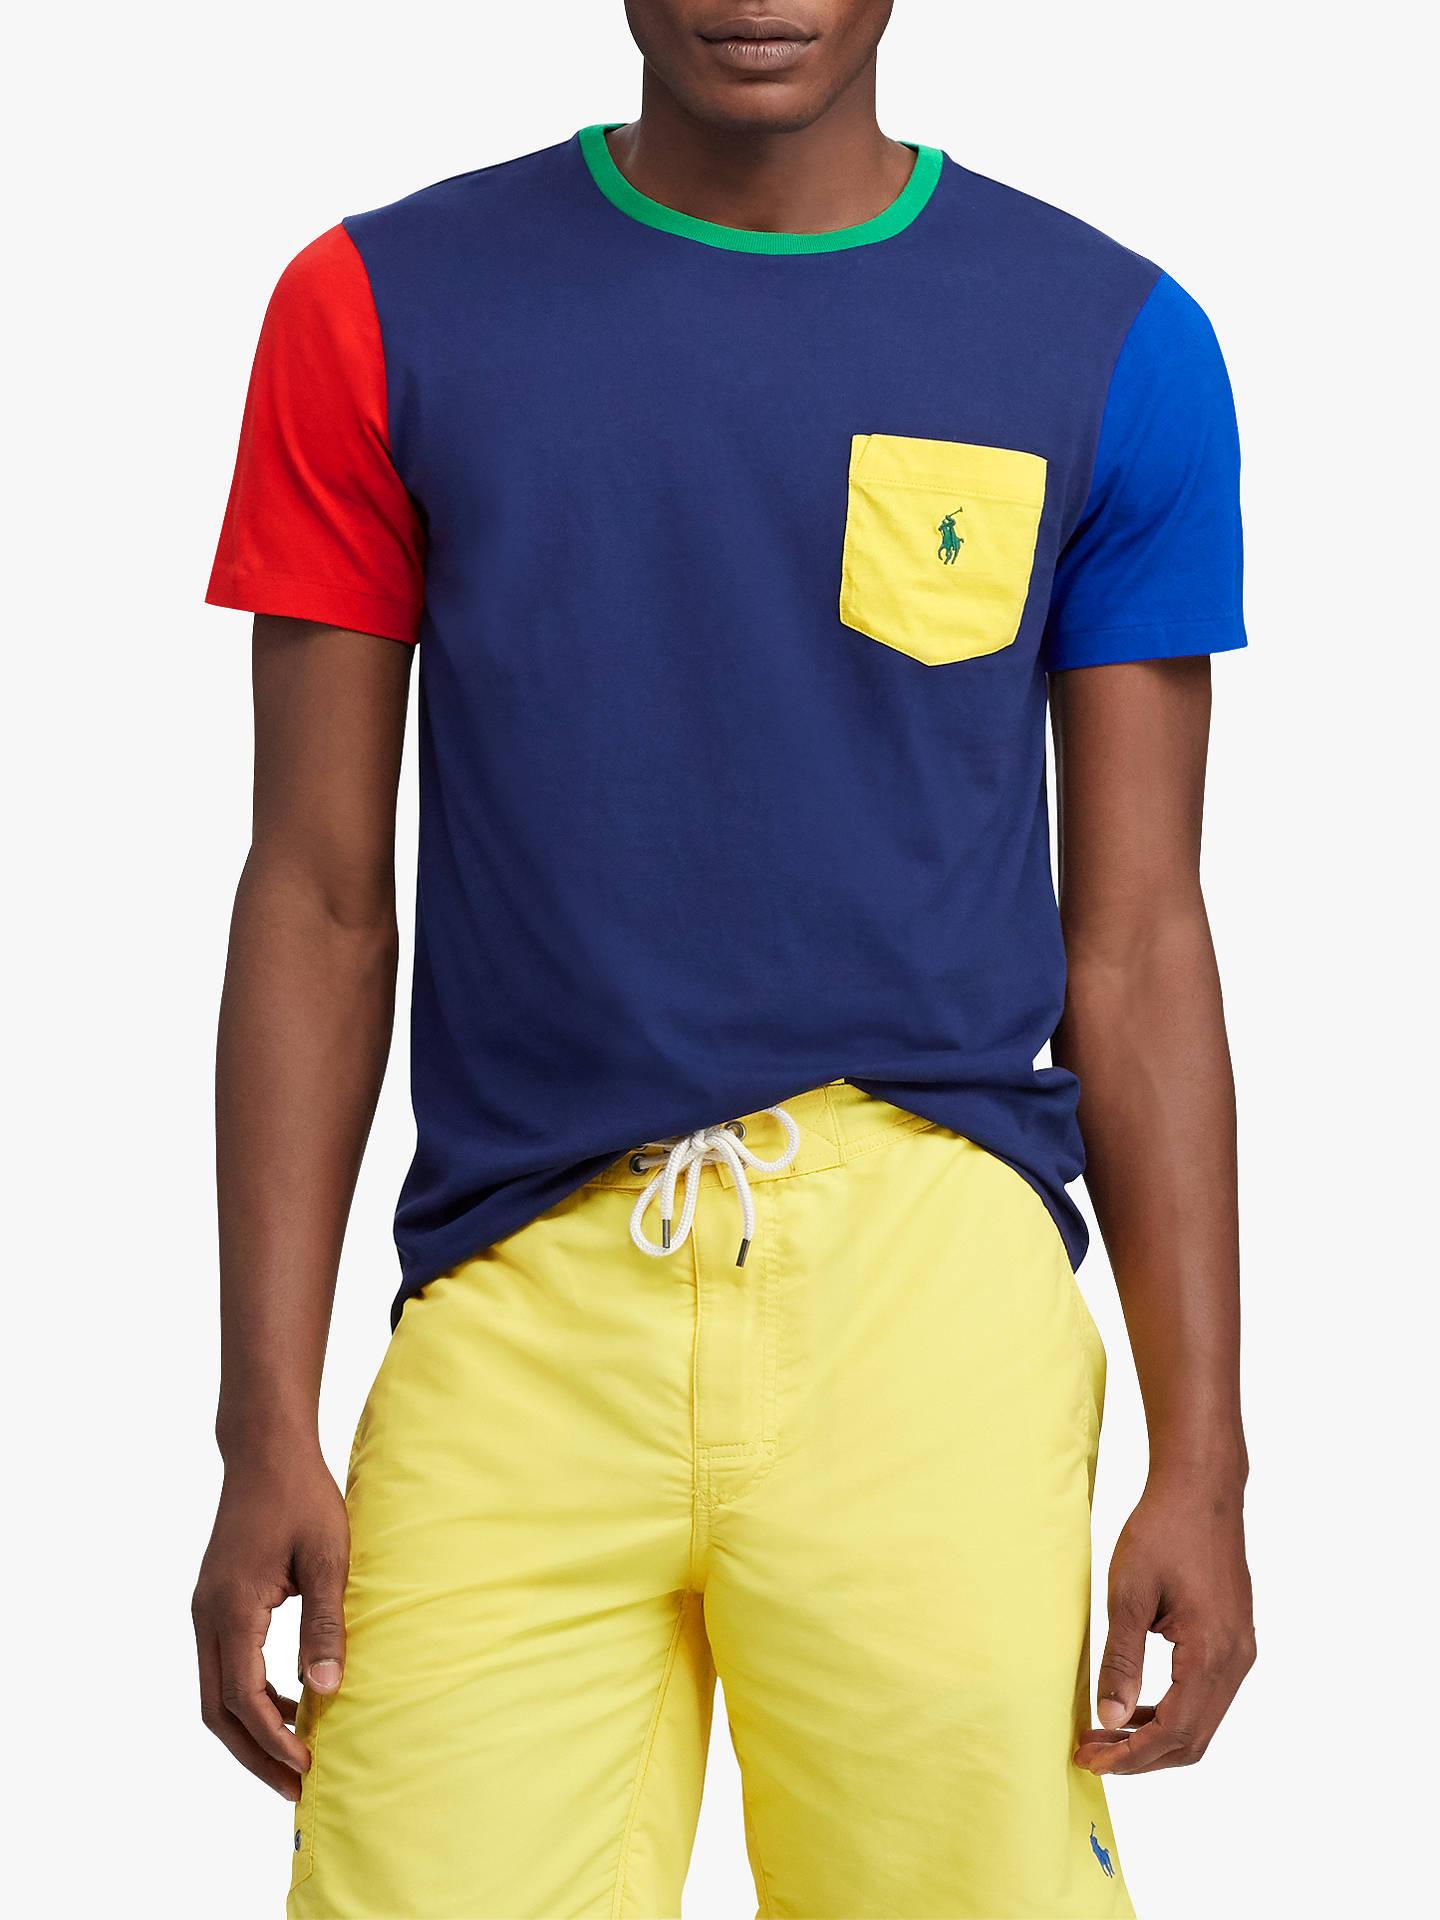 c2cc725b47229 Buy Polo Ralph Lauren Colour Block Pocket Short Sleeve T-Shirt